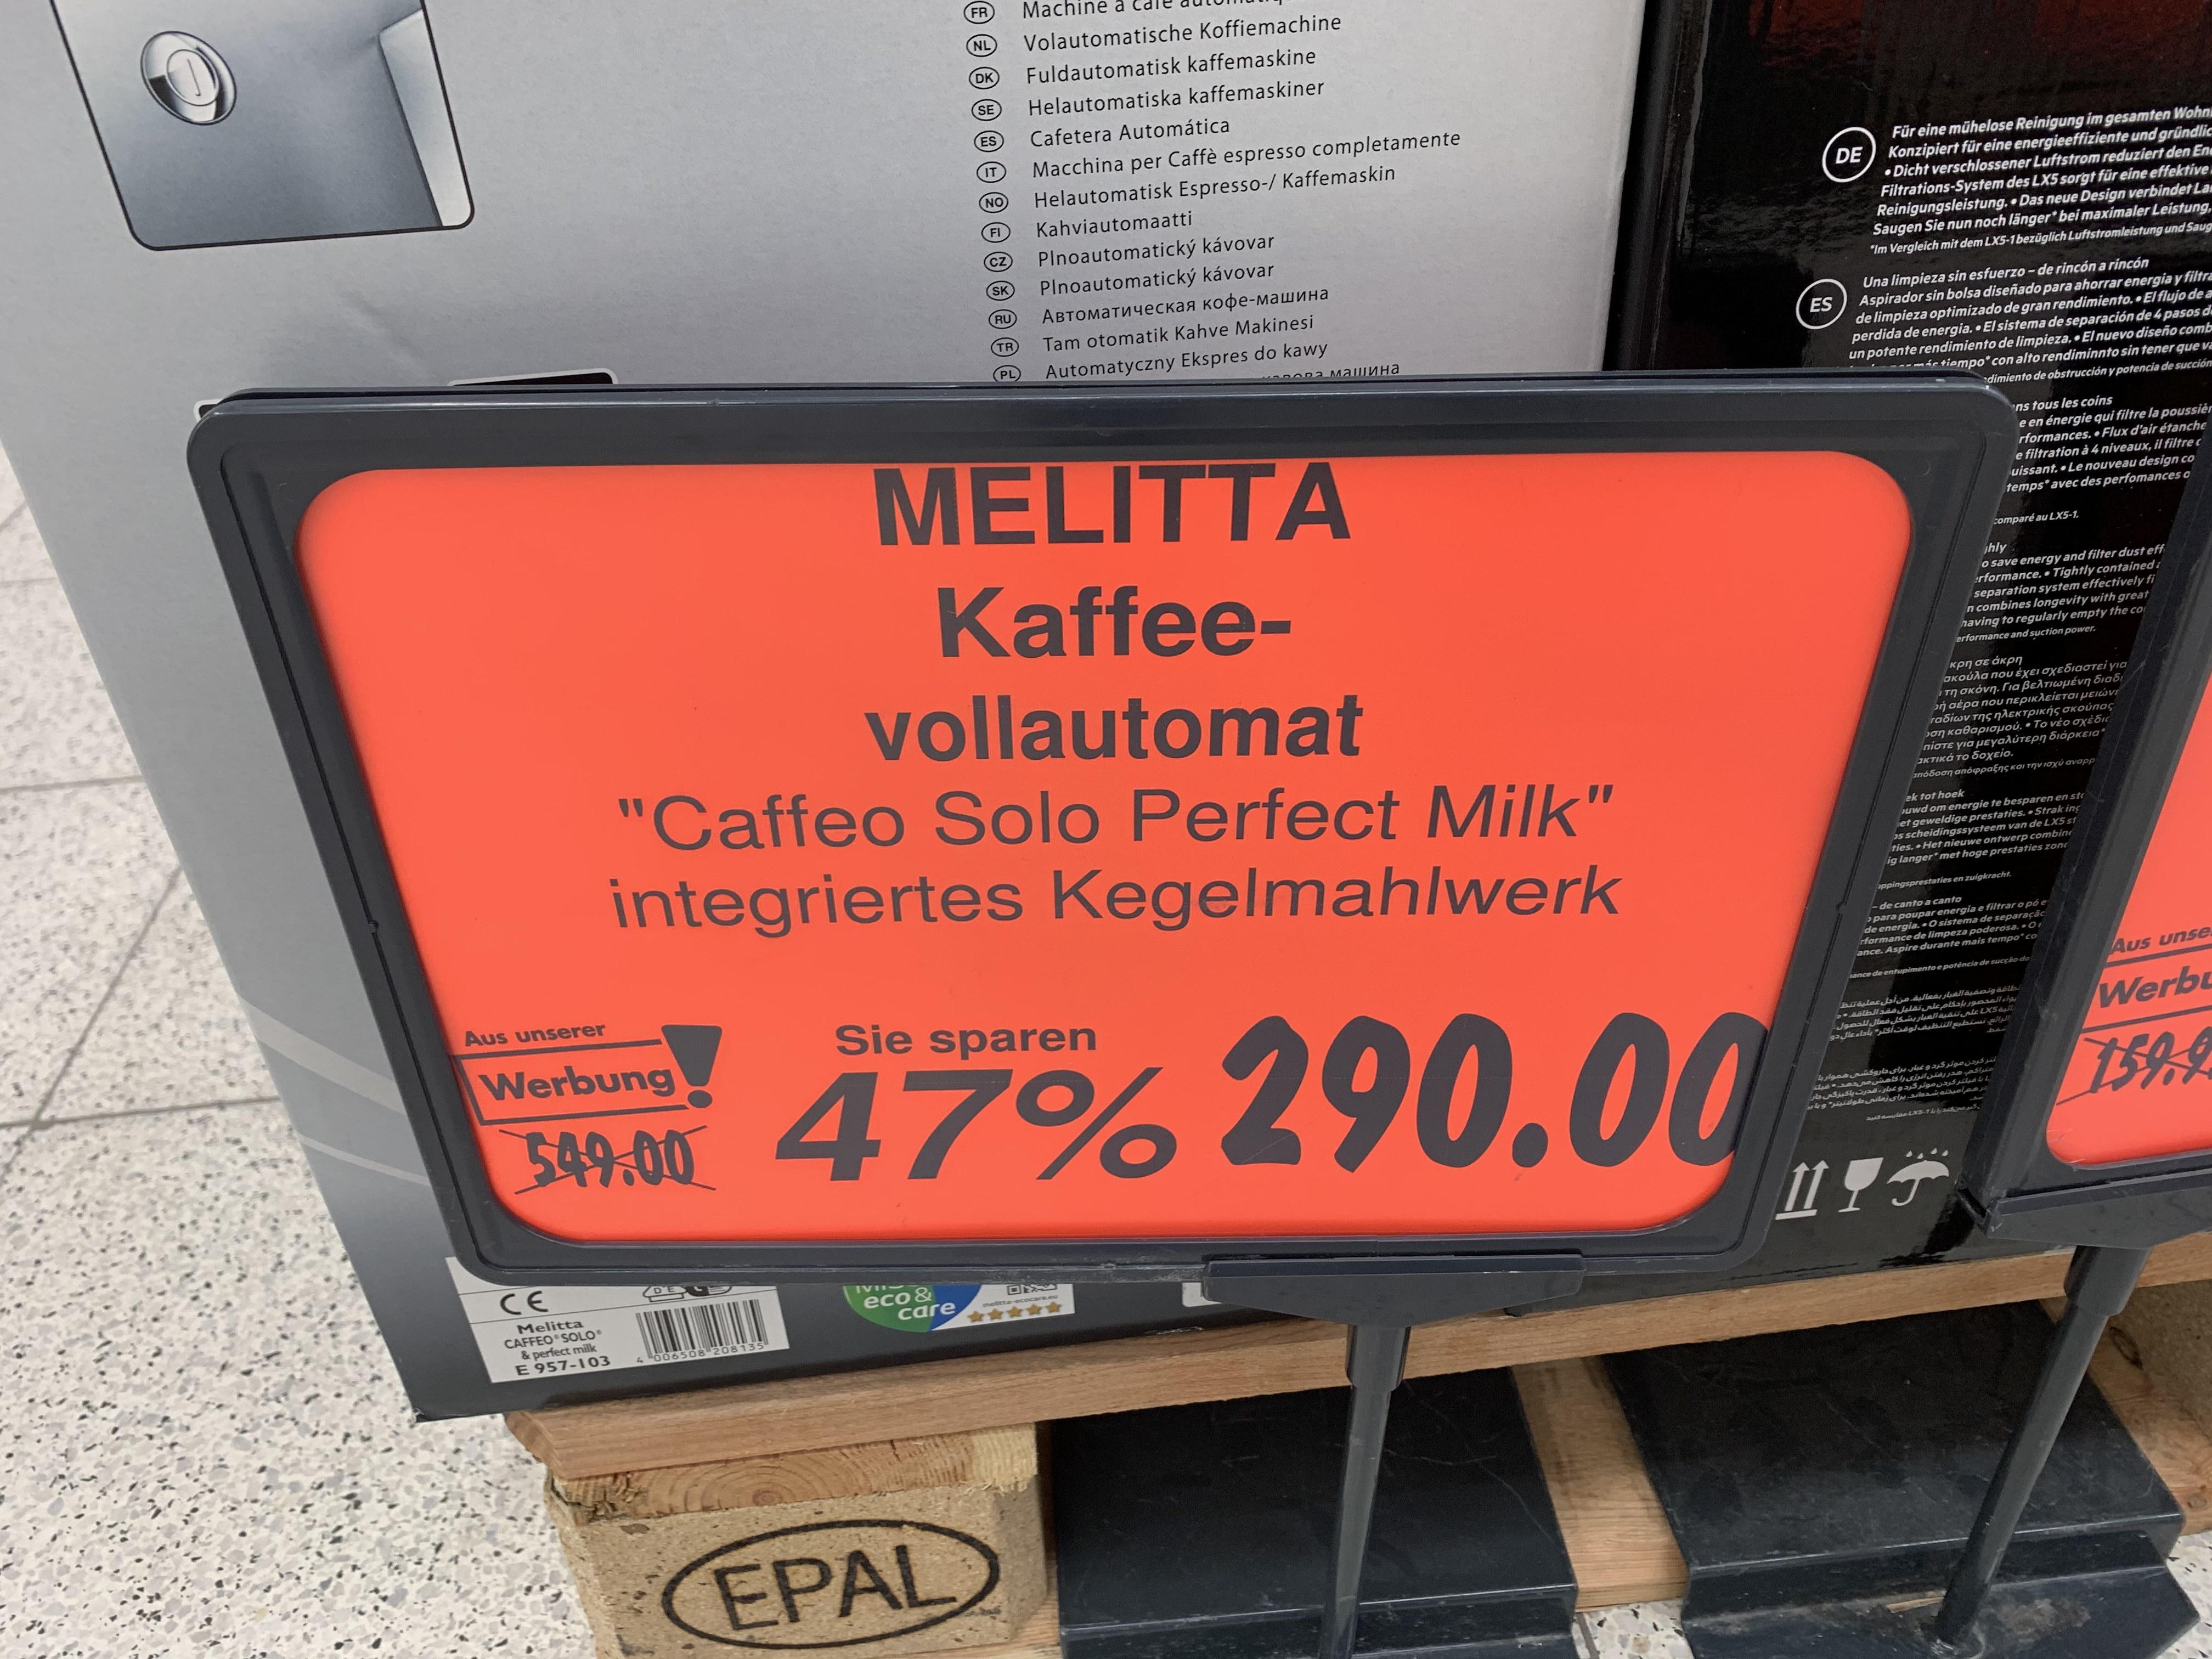 Lokal Kaufland Dallgow Melitta E 957-103 Kaffeevollautomat Caffeo Solo